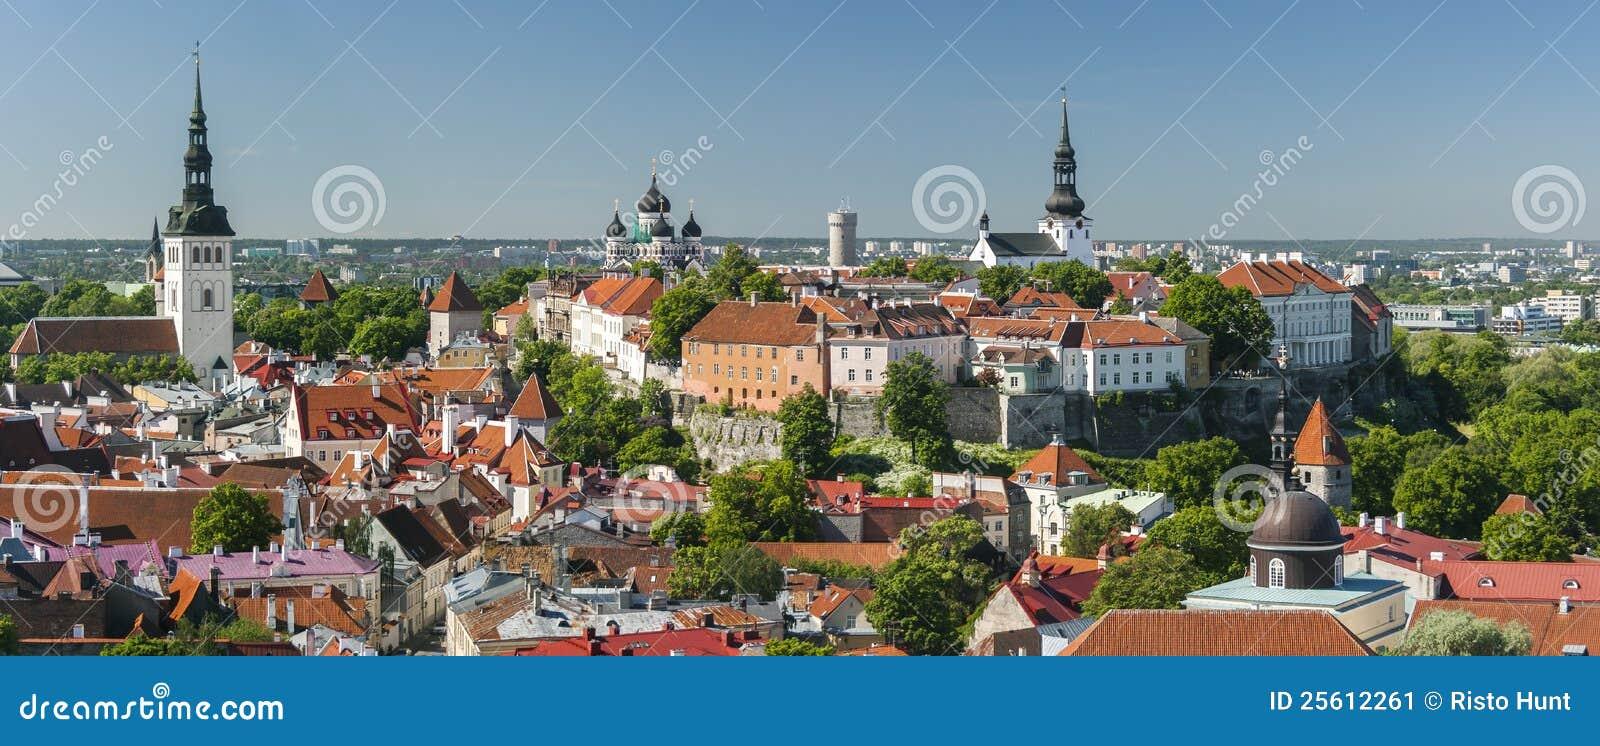 Panorama del verano de la ciudad vieja de Tallinn, Estonia